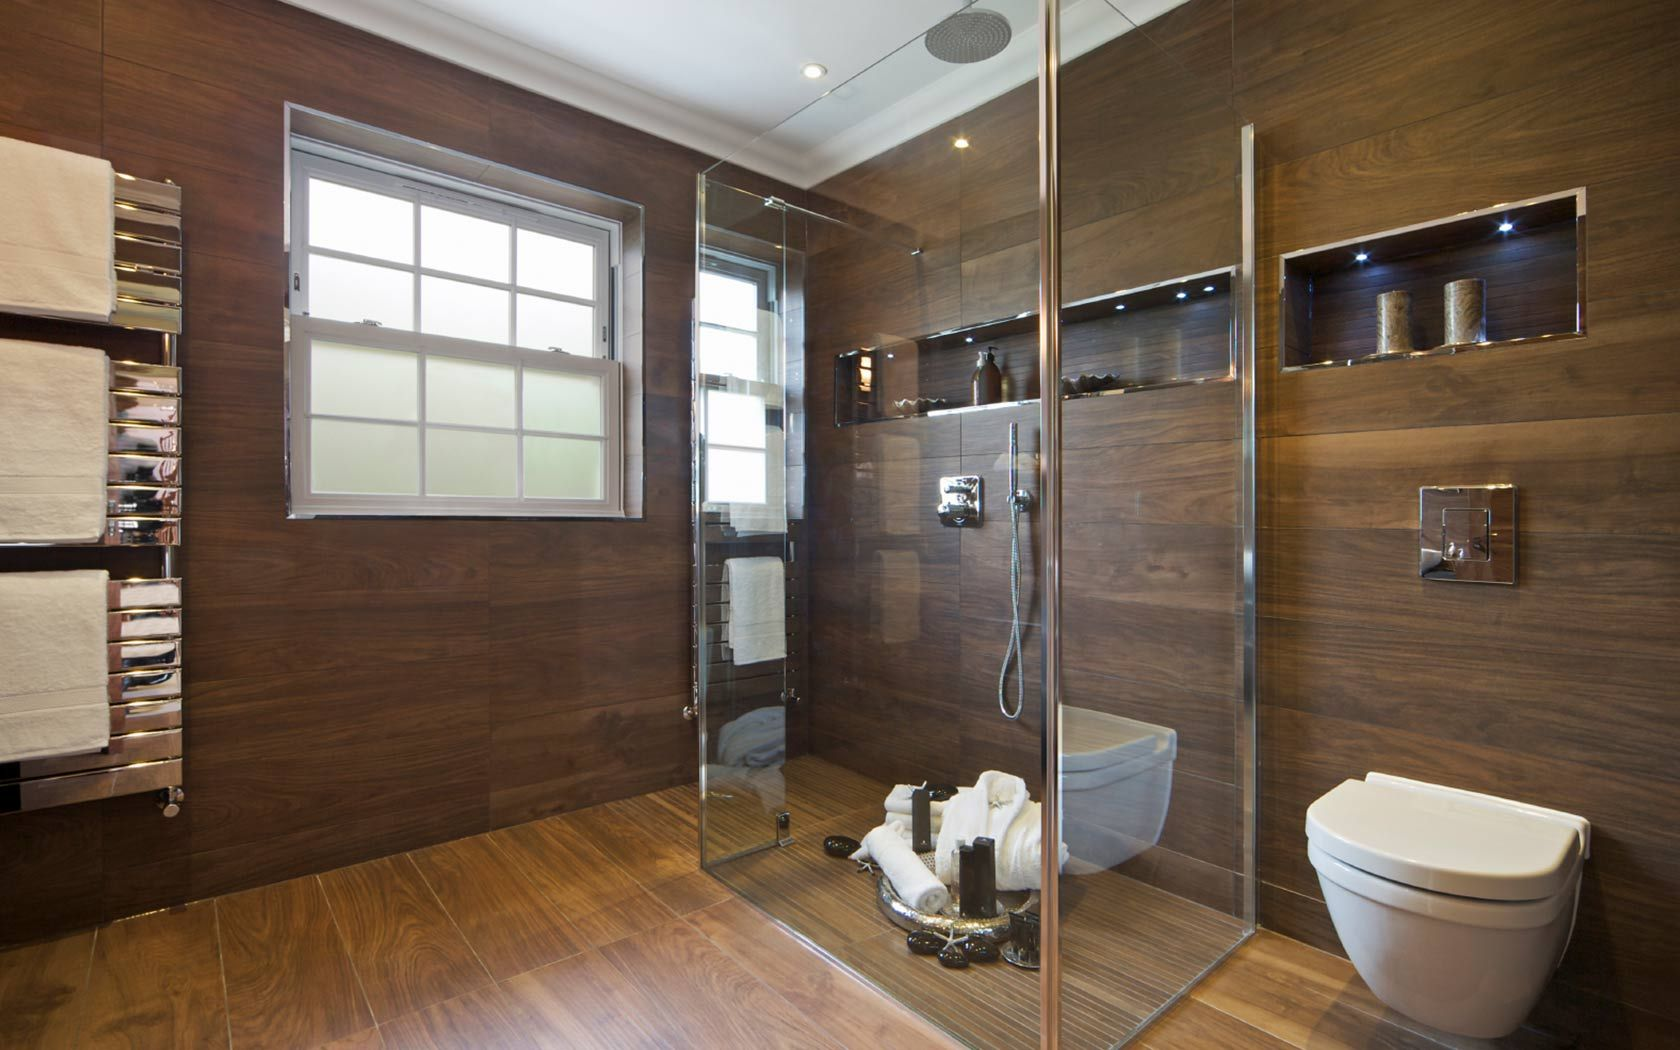 Sustainable #bathroomdesign ideas - Ways to lower your bathroom's environmental impac